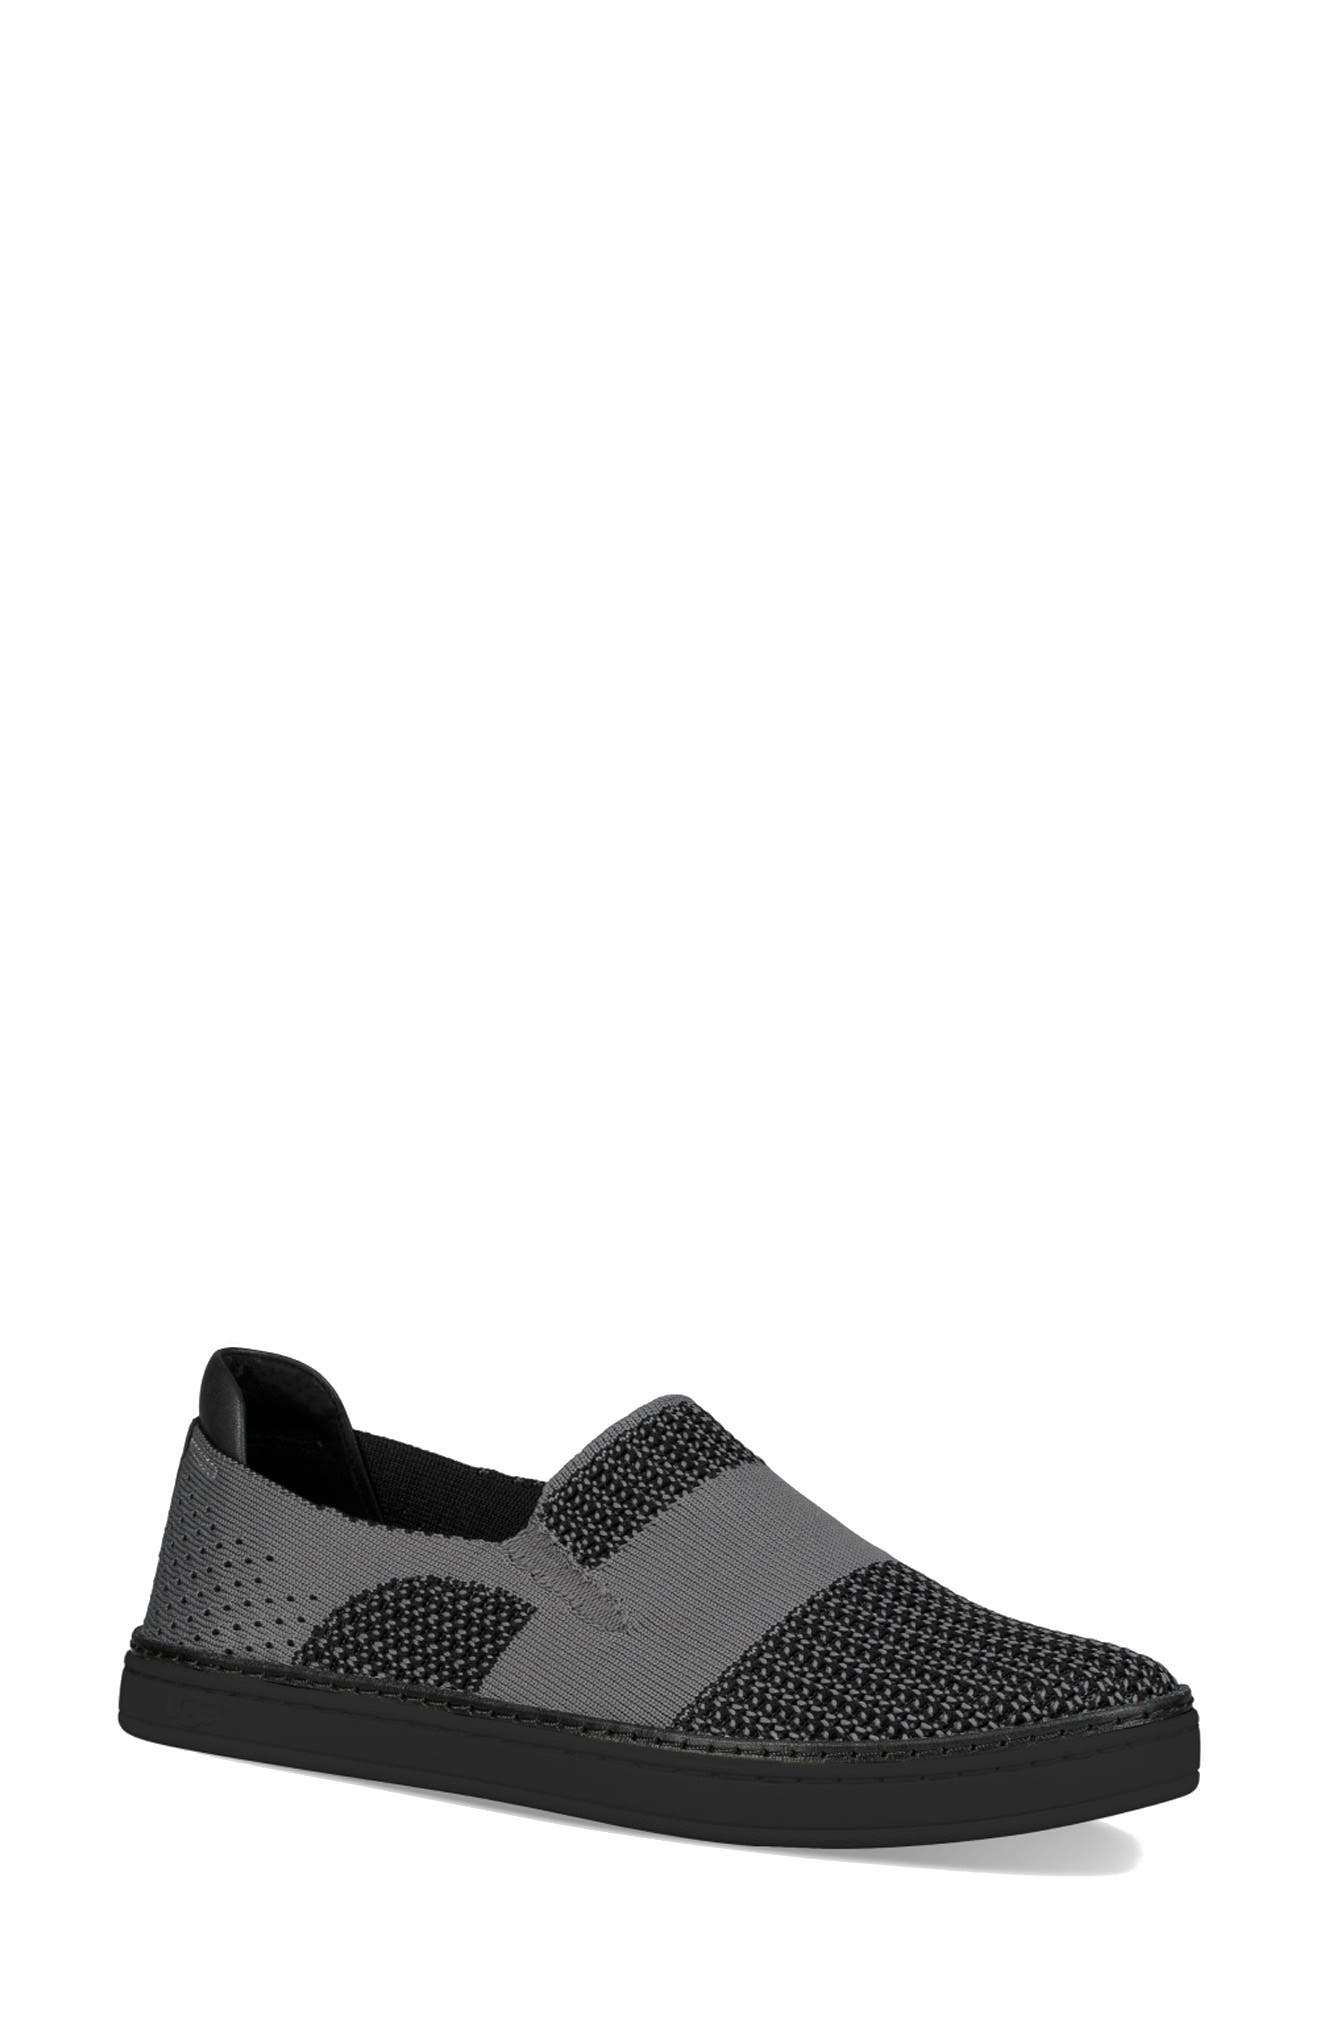 Sammy Sneaker,                             Main thumbnail 1, color,                             Black/ Black Fabric